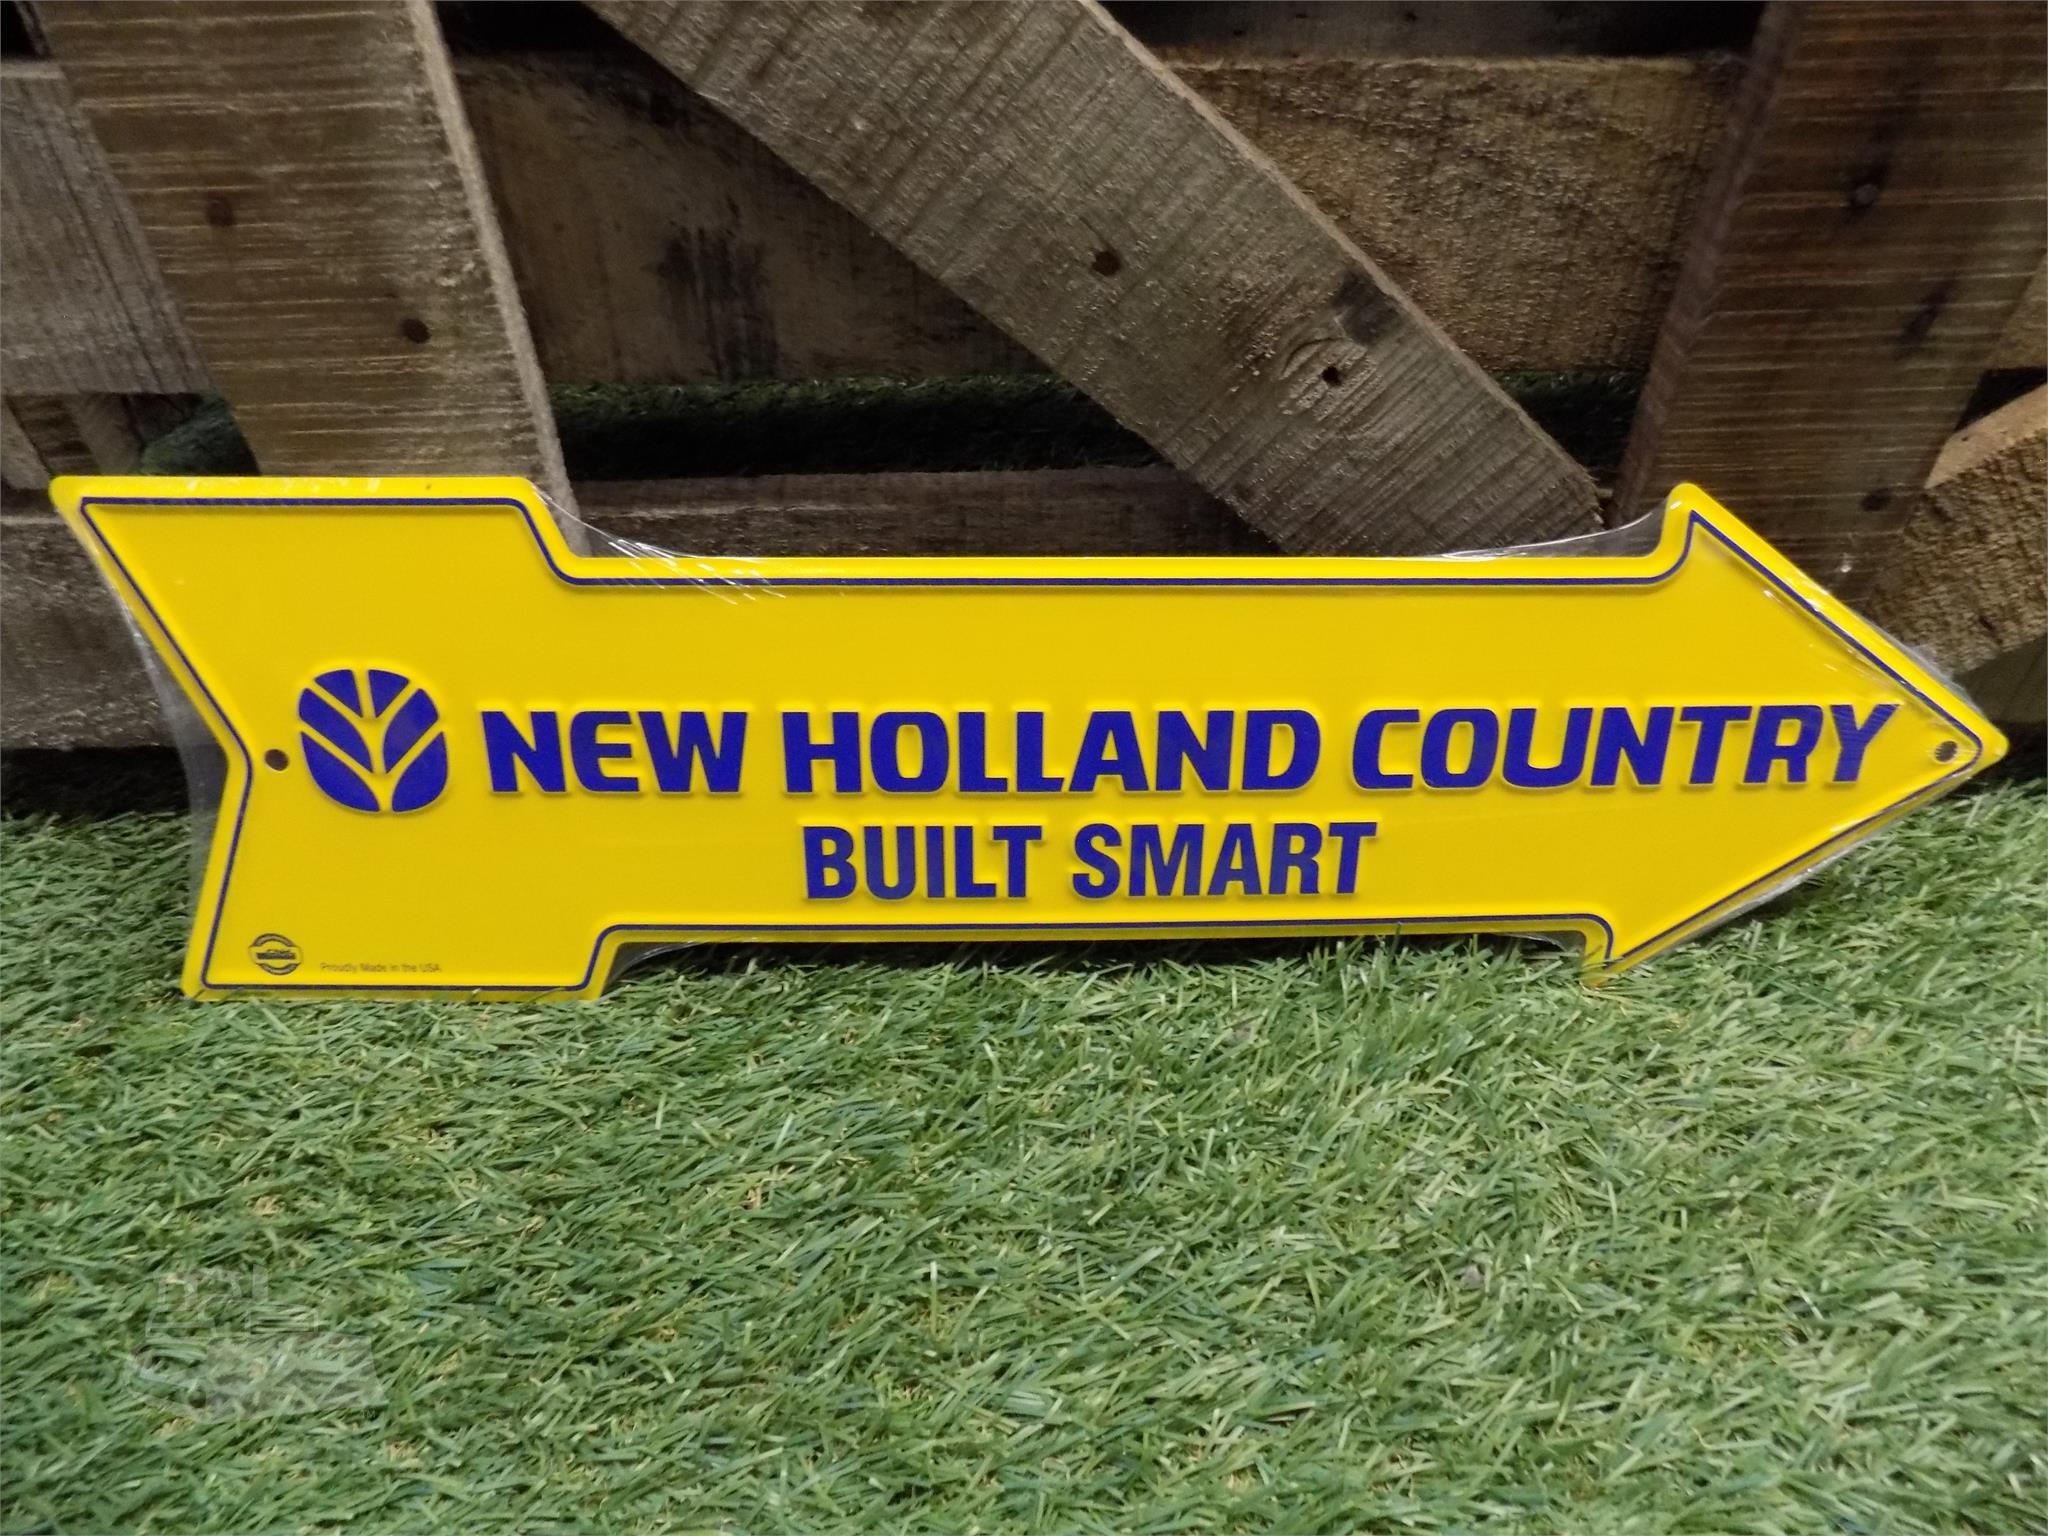 NEW HOLLAND NEW HOLLAND COUNTRY SIGN Zum Verkauf   10 Anzeigen ...